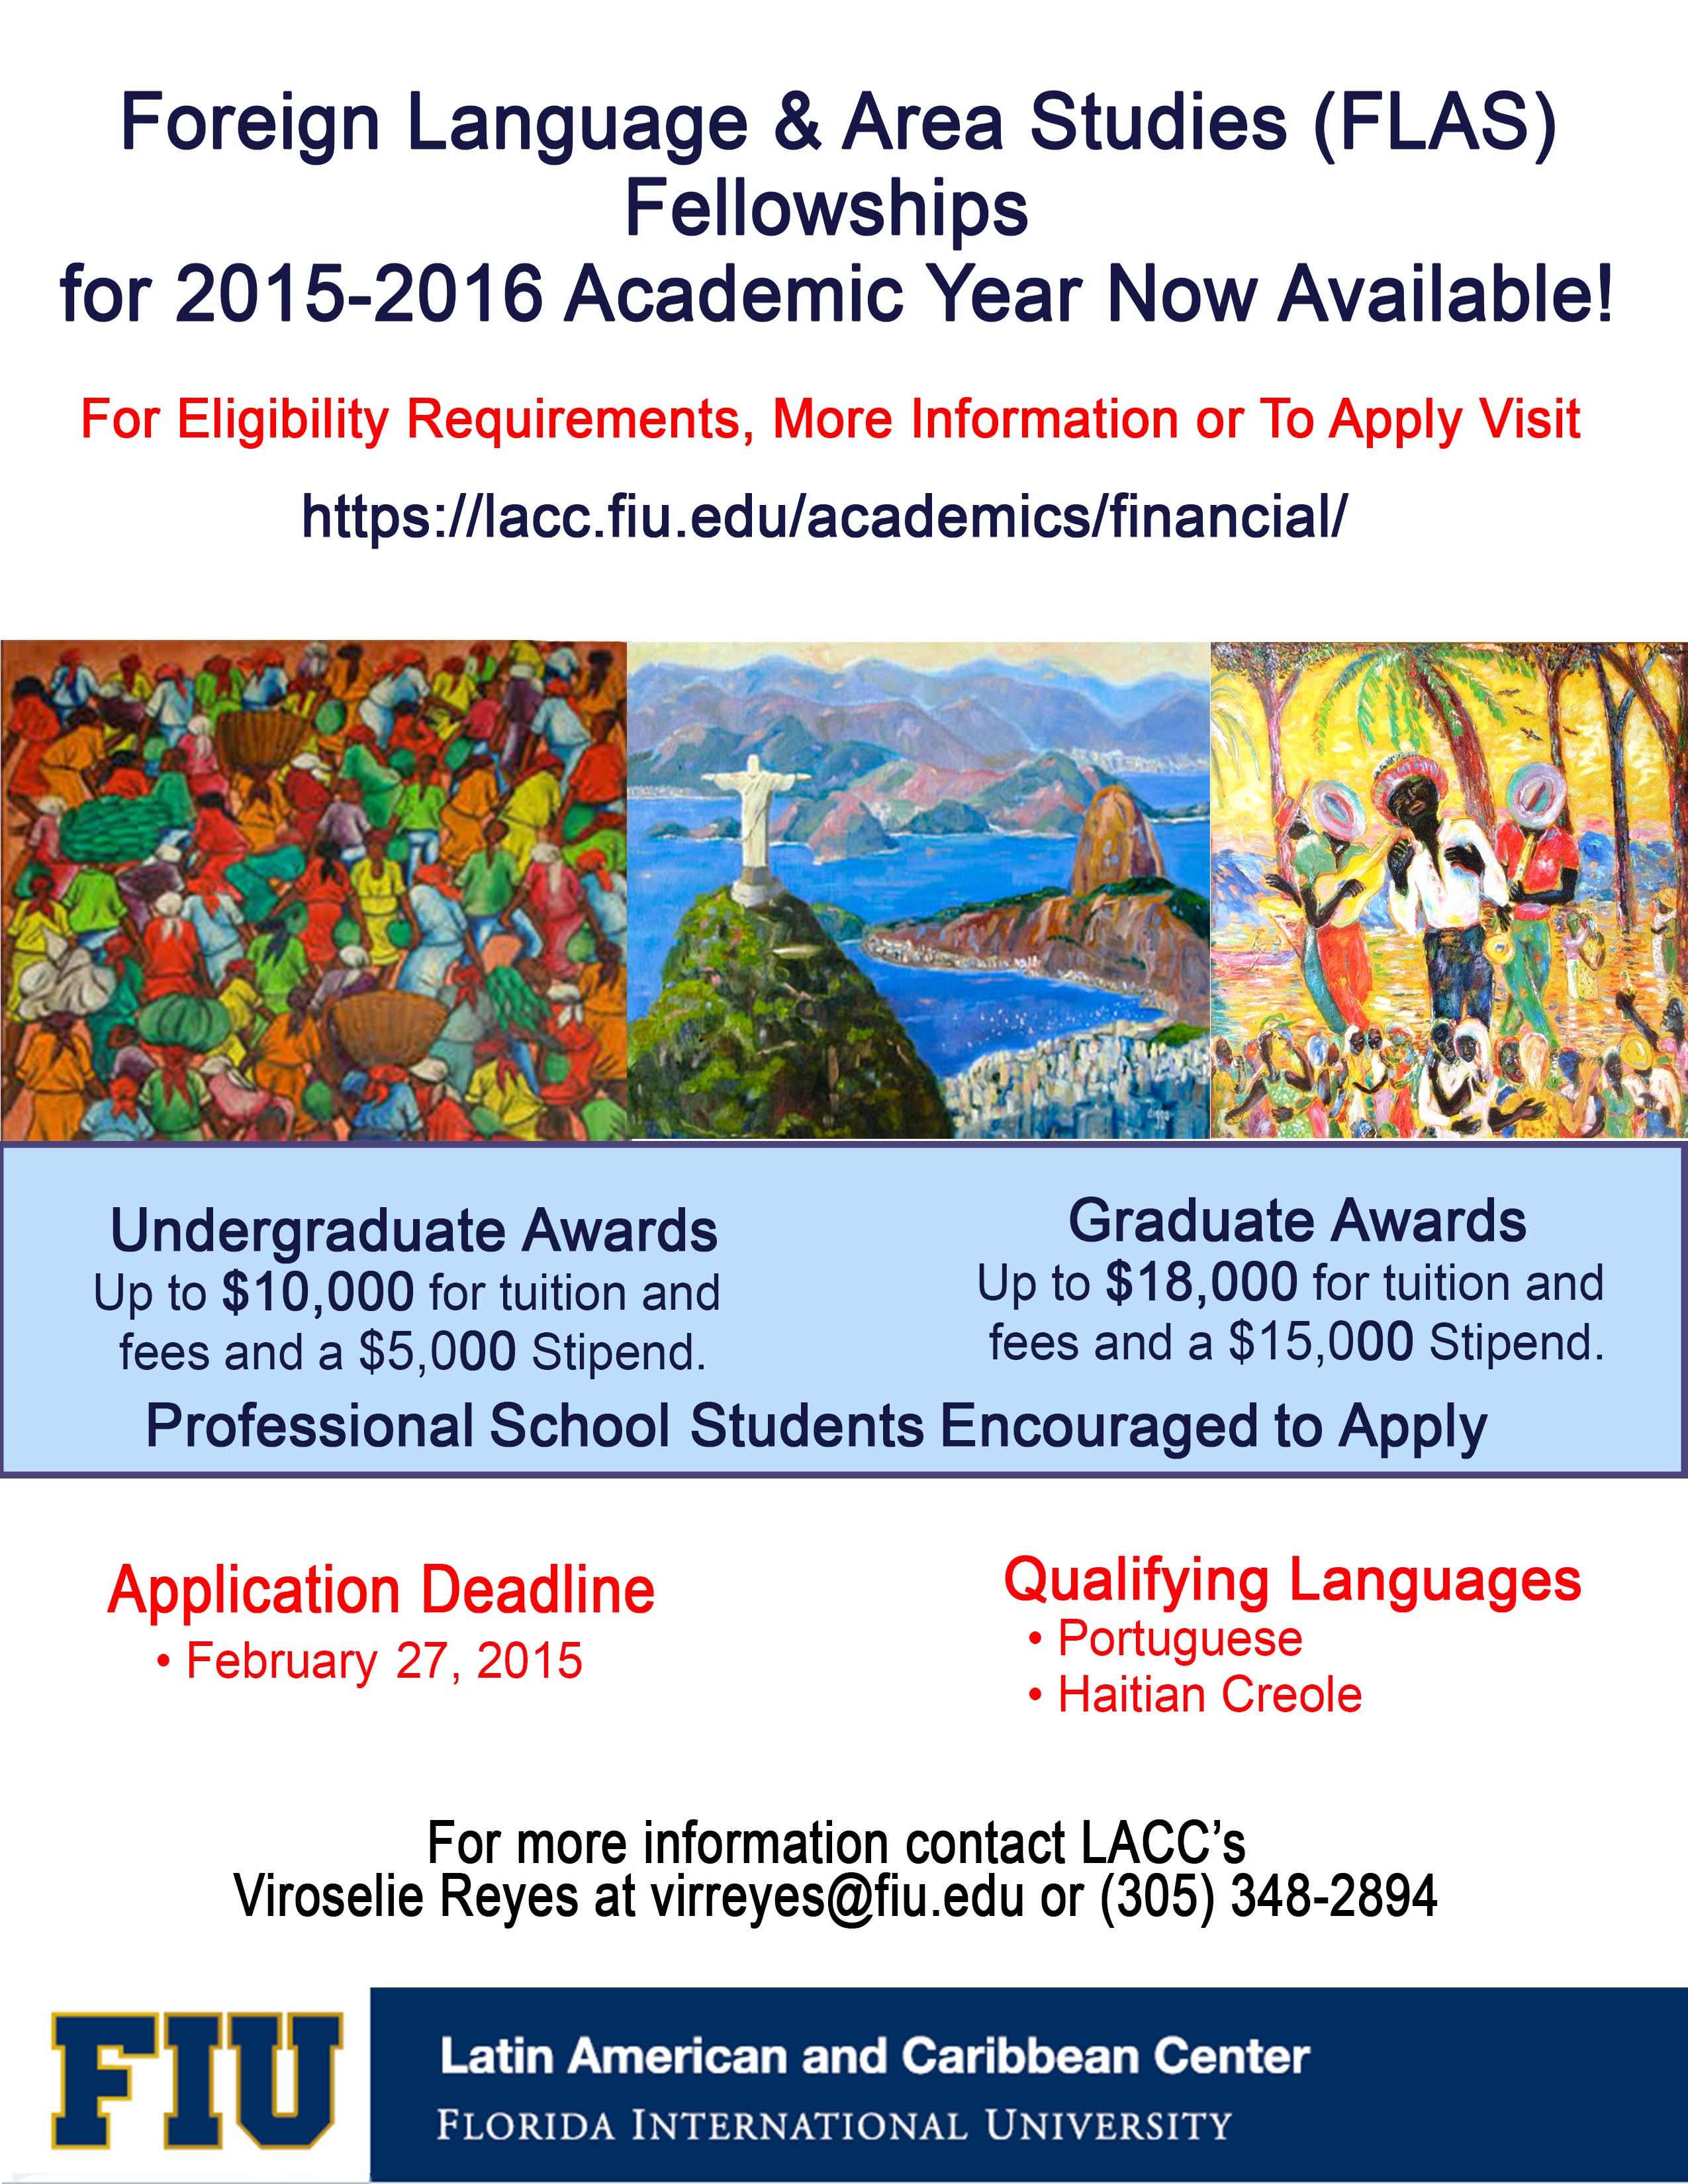 FLAS Academic Year 2015-2016